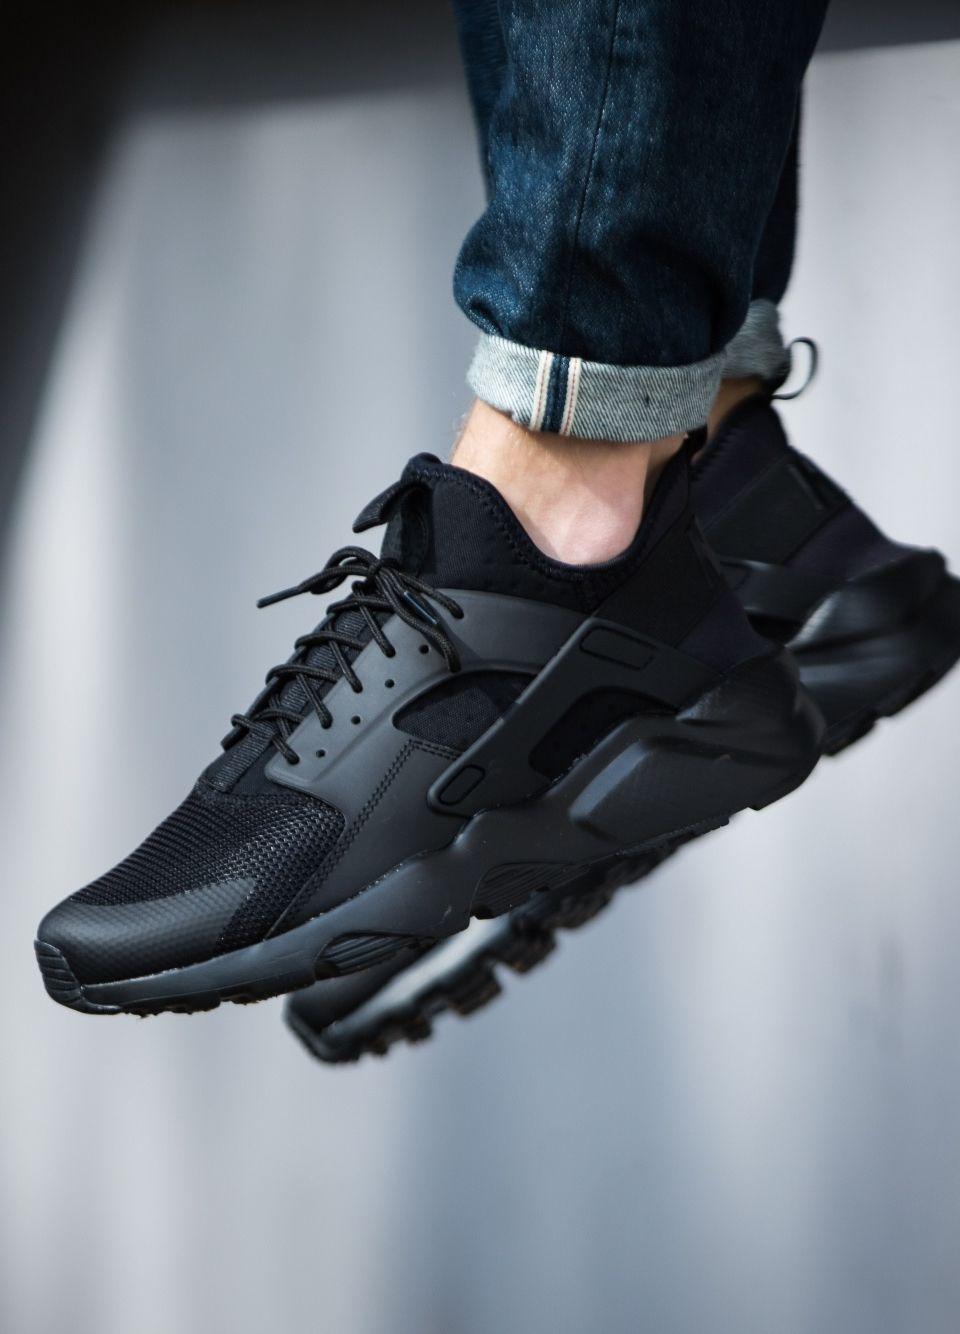 Sportswear Sneakers Nike Air Huarache Run Ultra Blackout Sneakers Men Fashion Nike Air Huarache Ultra Nike Air Huarache